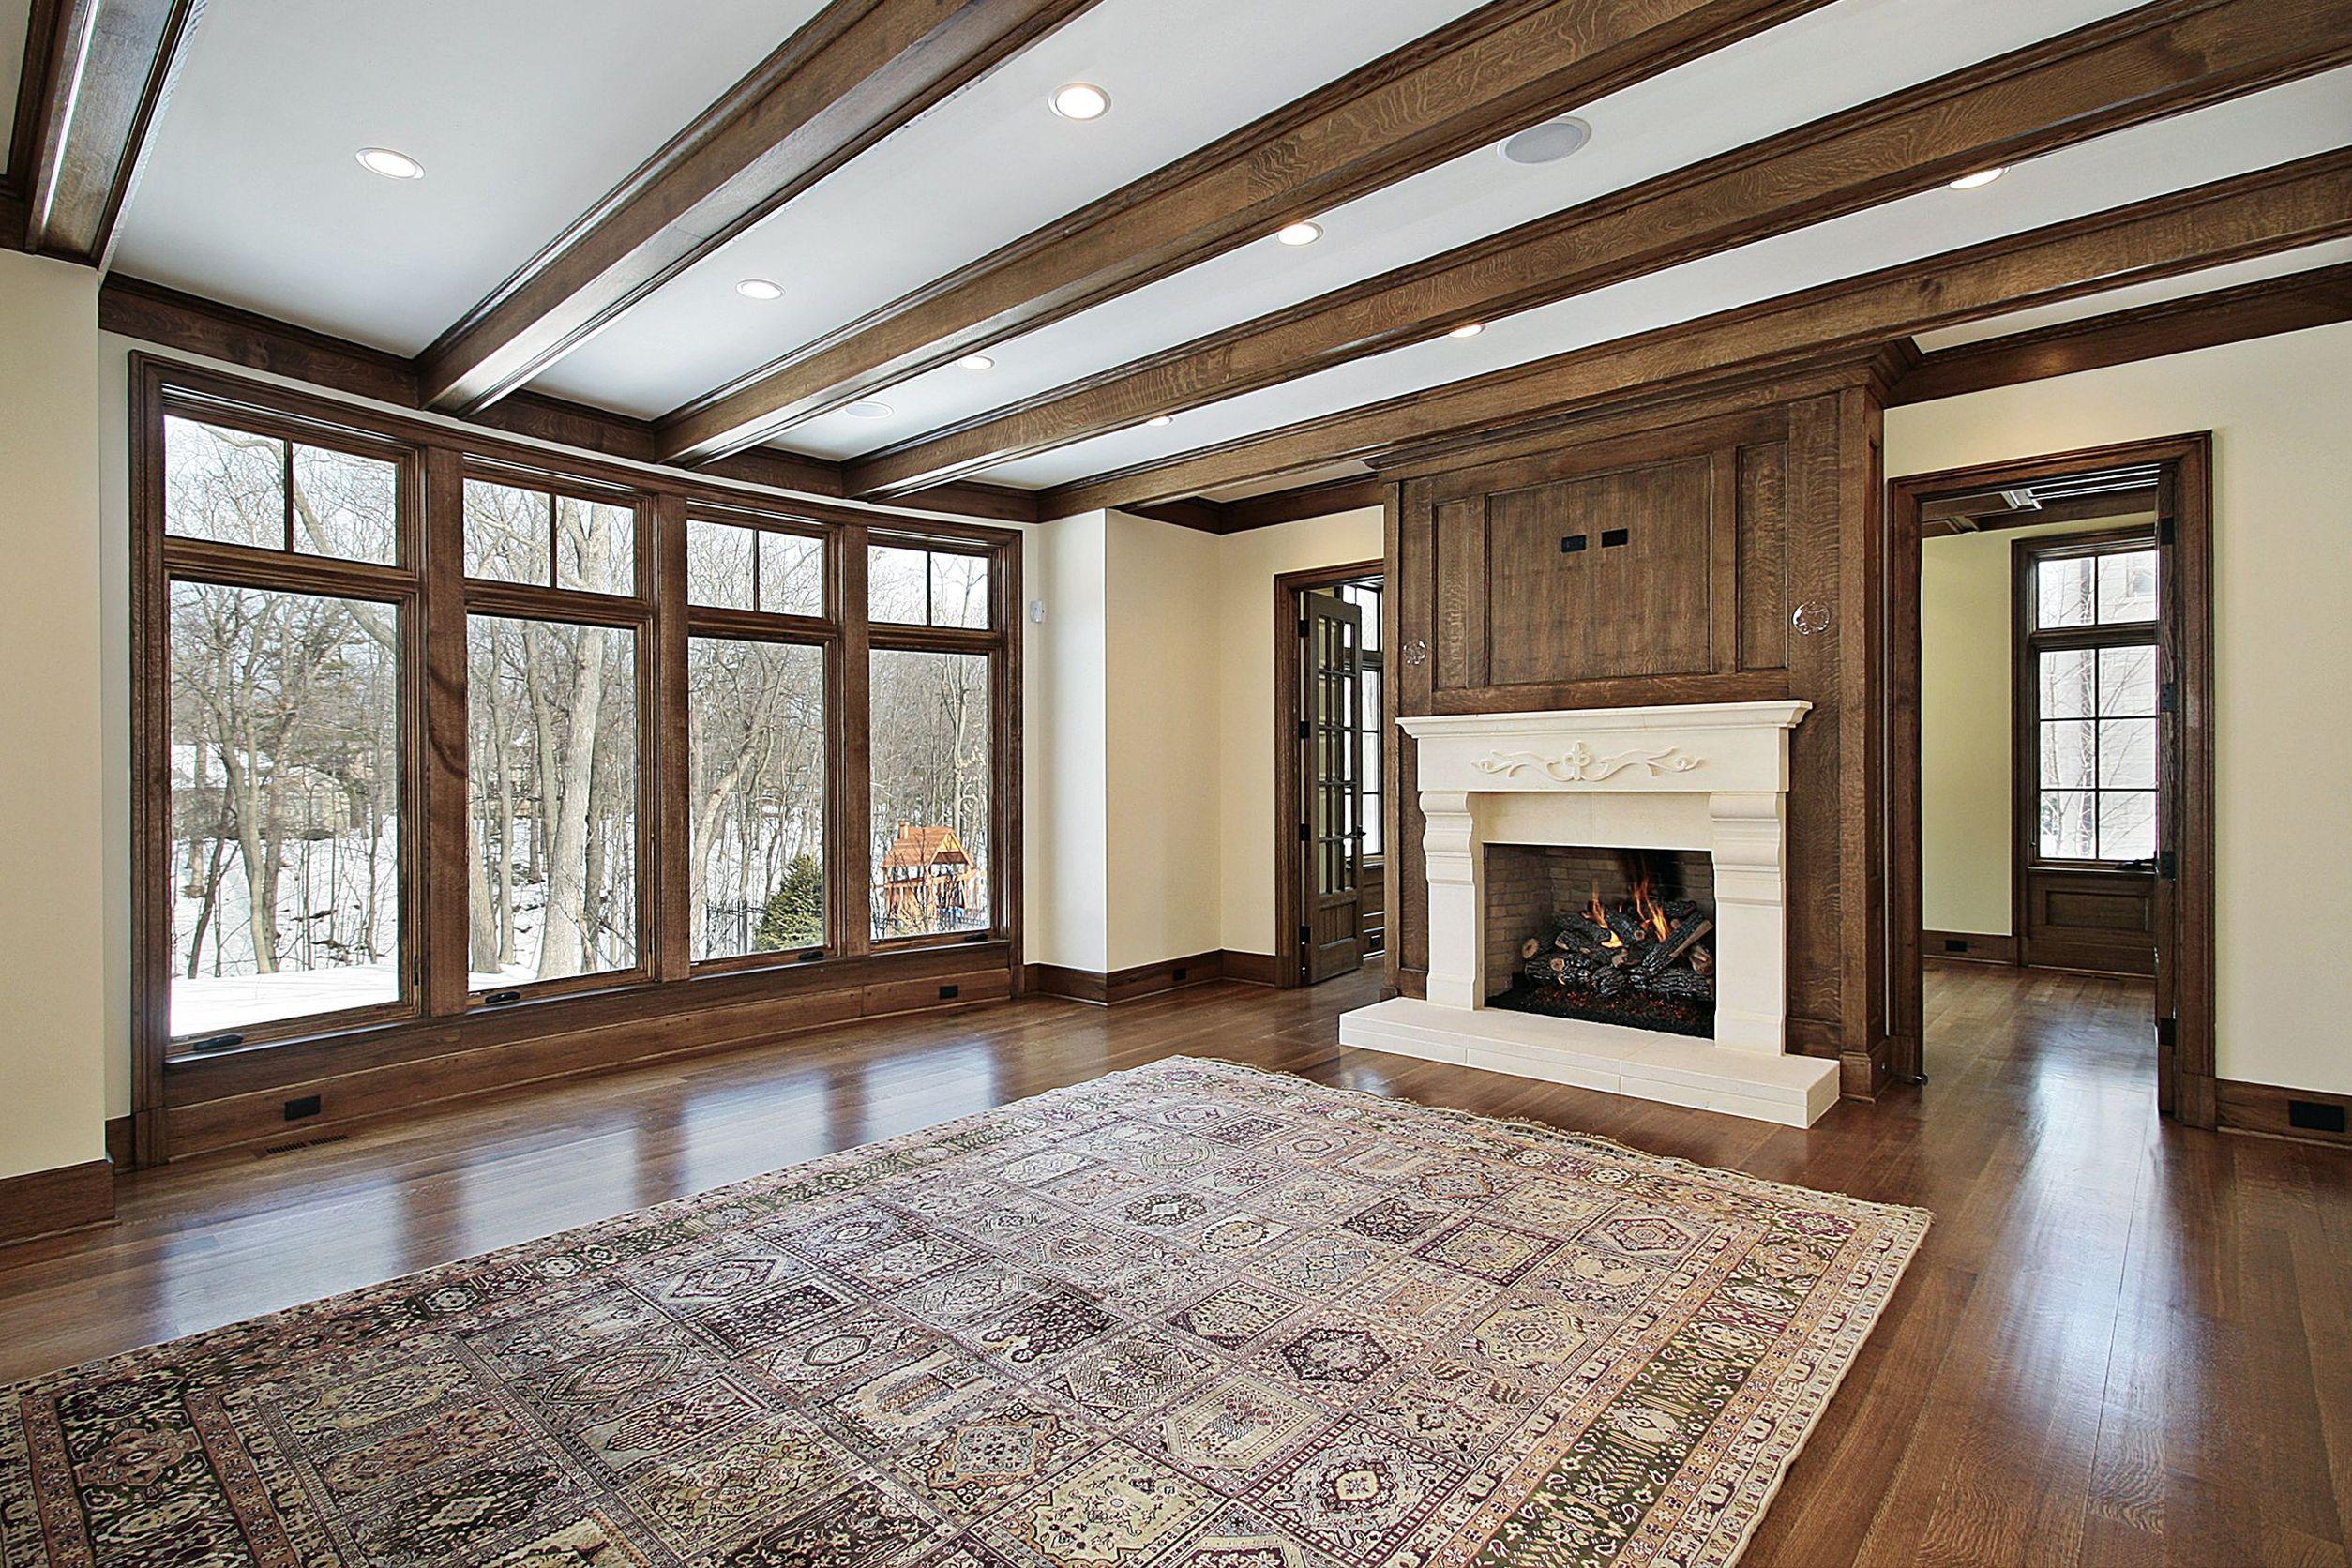 good interior design is always impressive